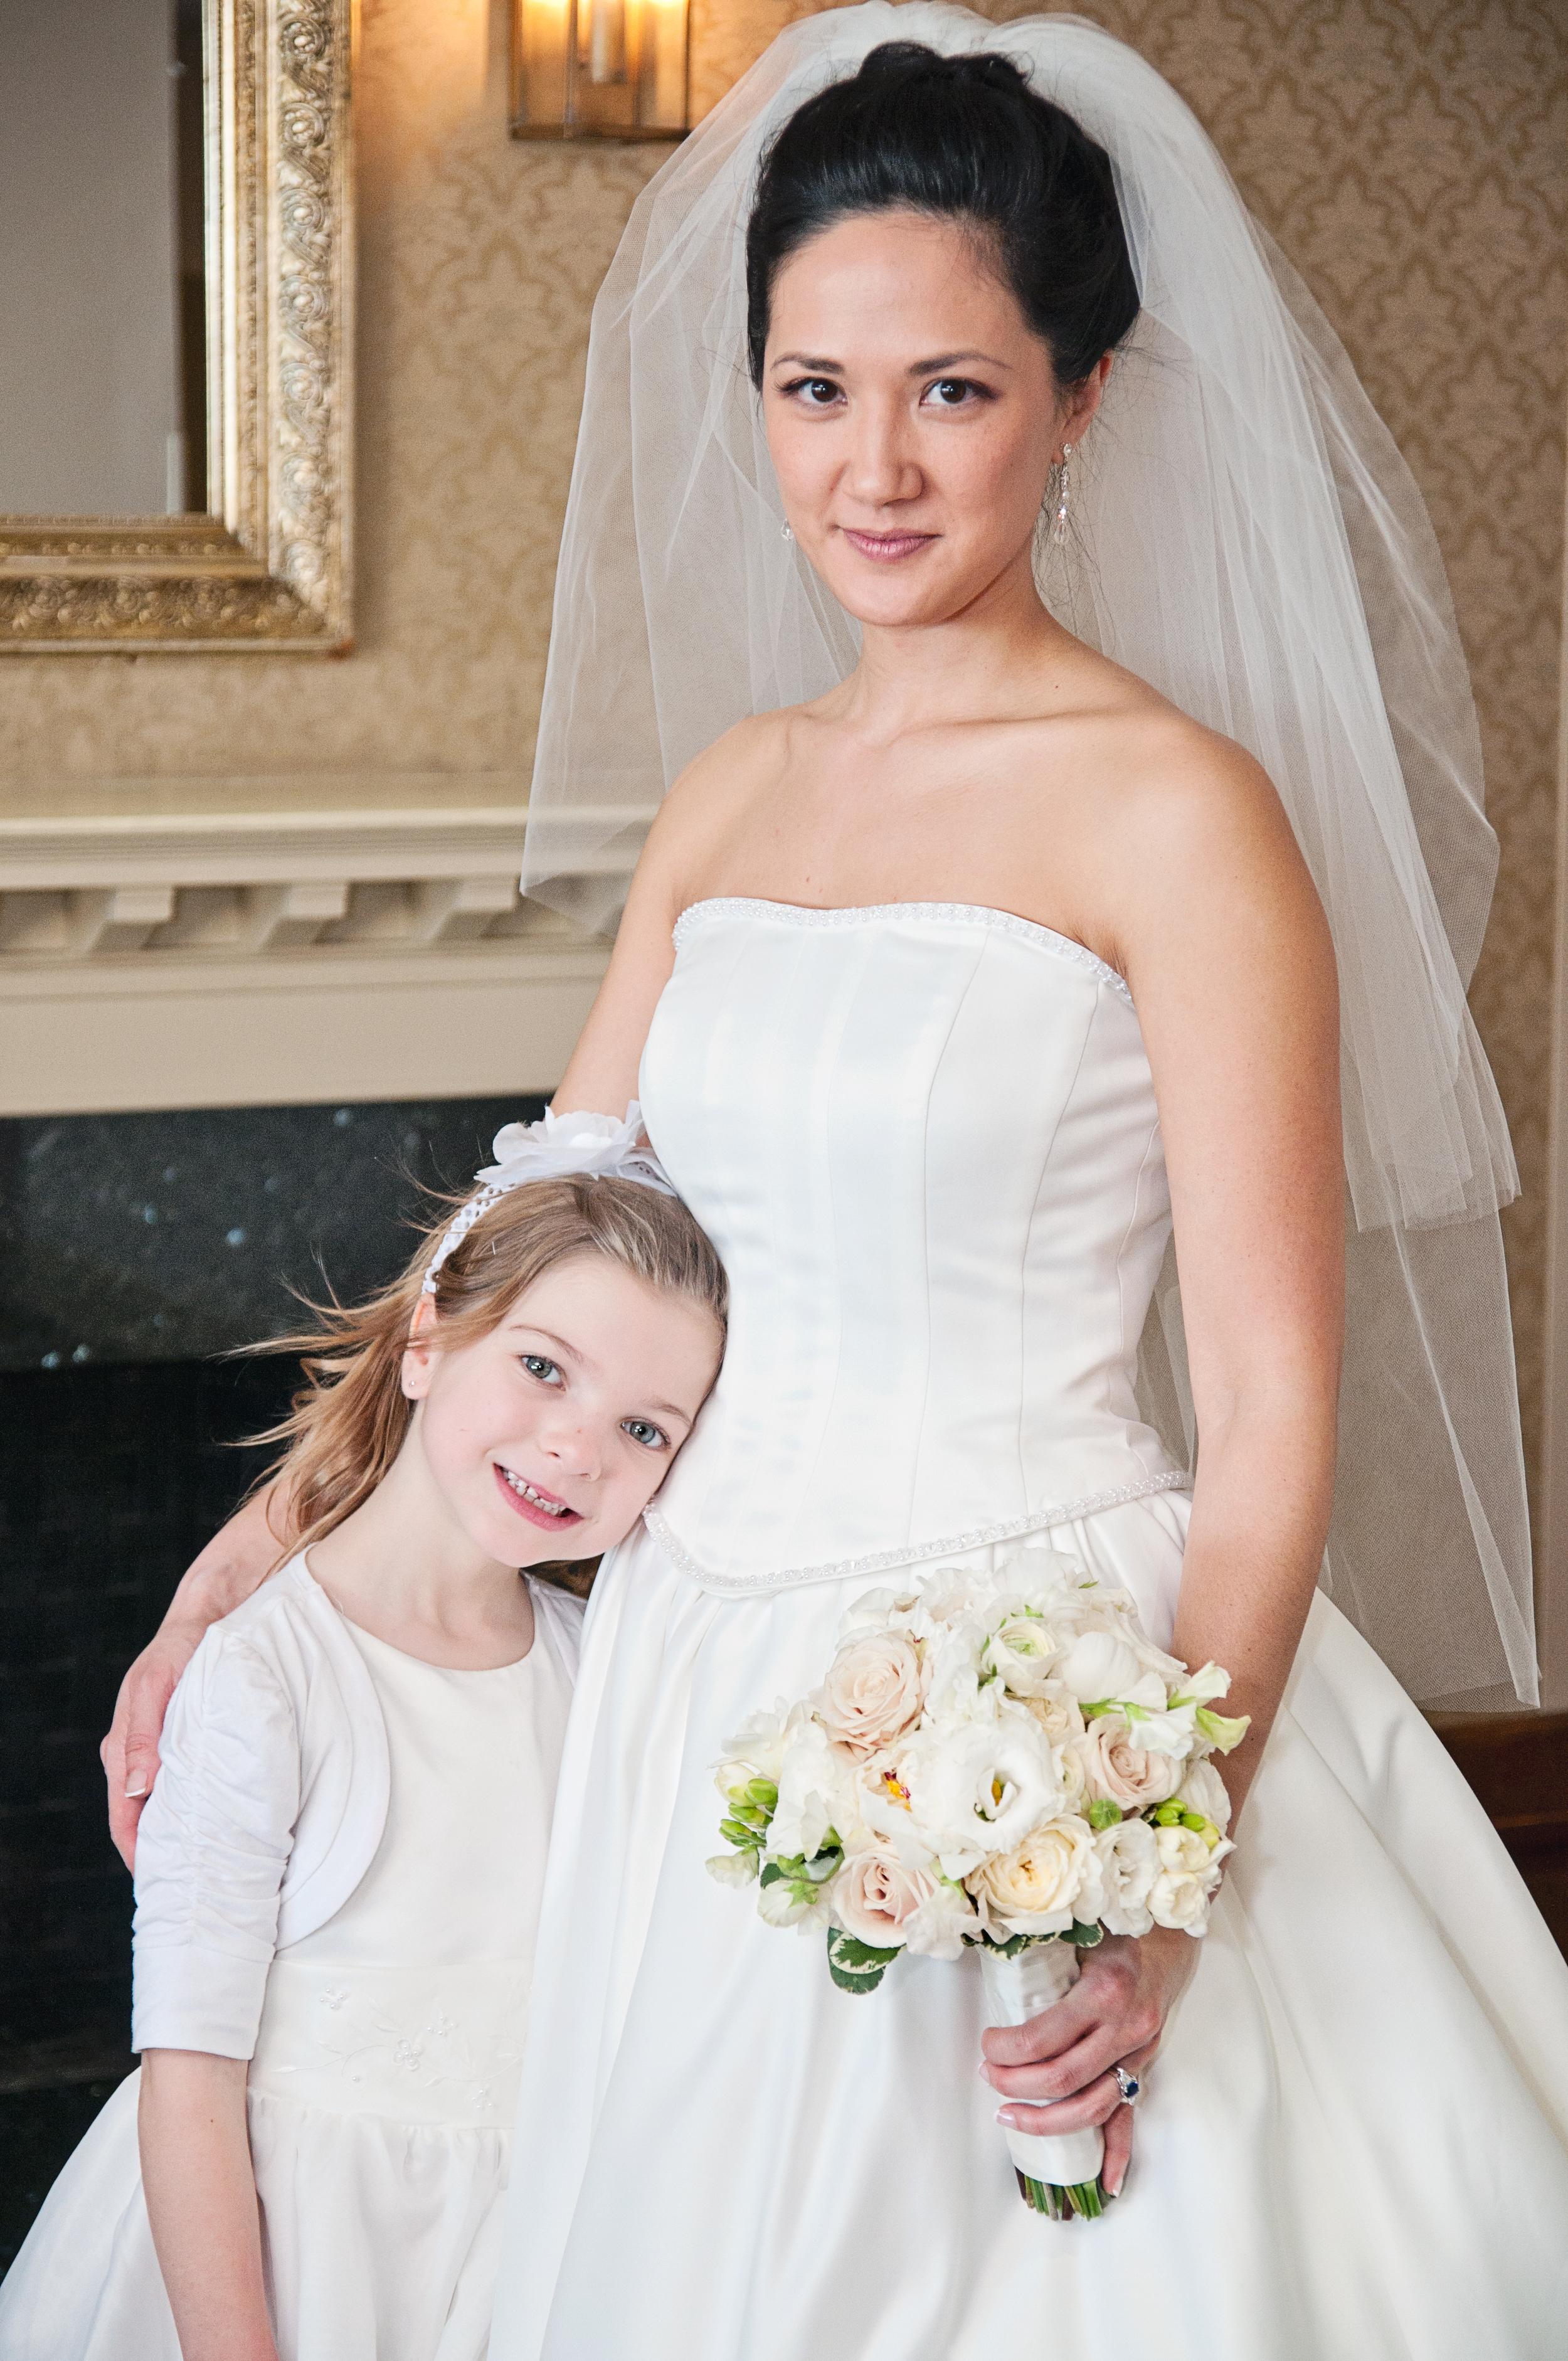 Angela_Chicoski_CT_wedding_photographer_051.jpg